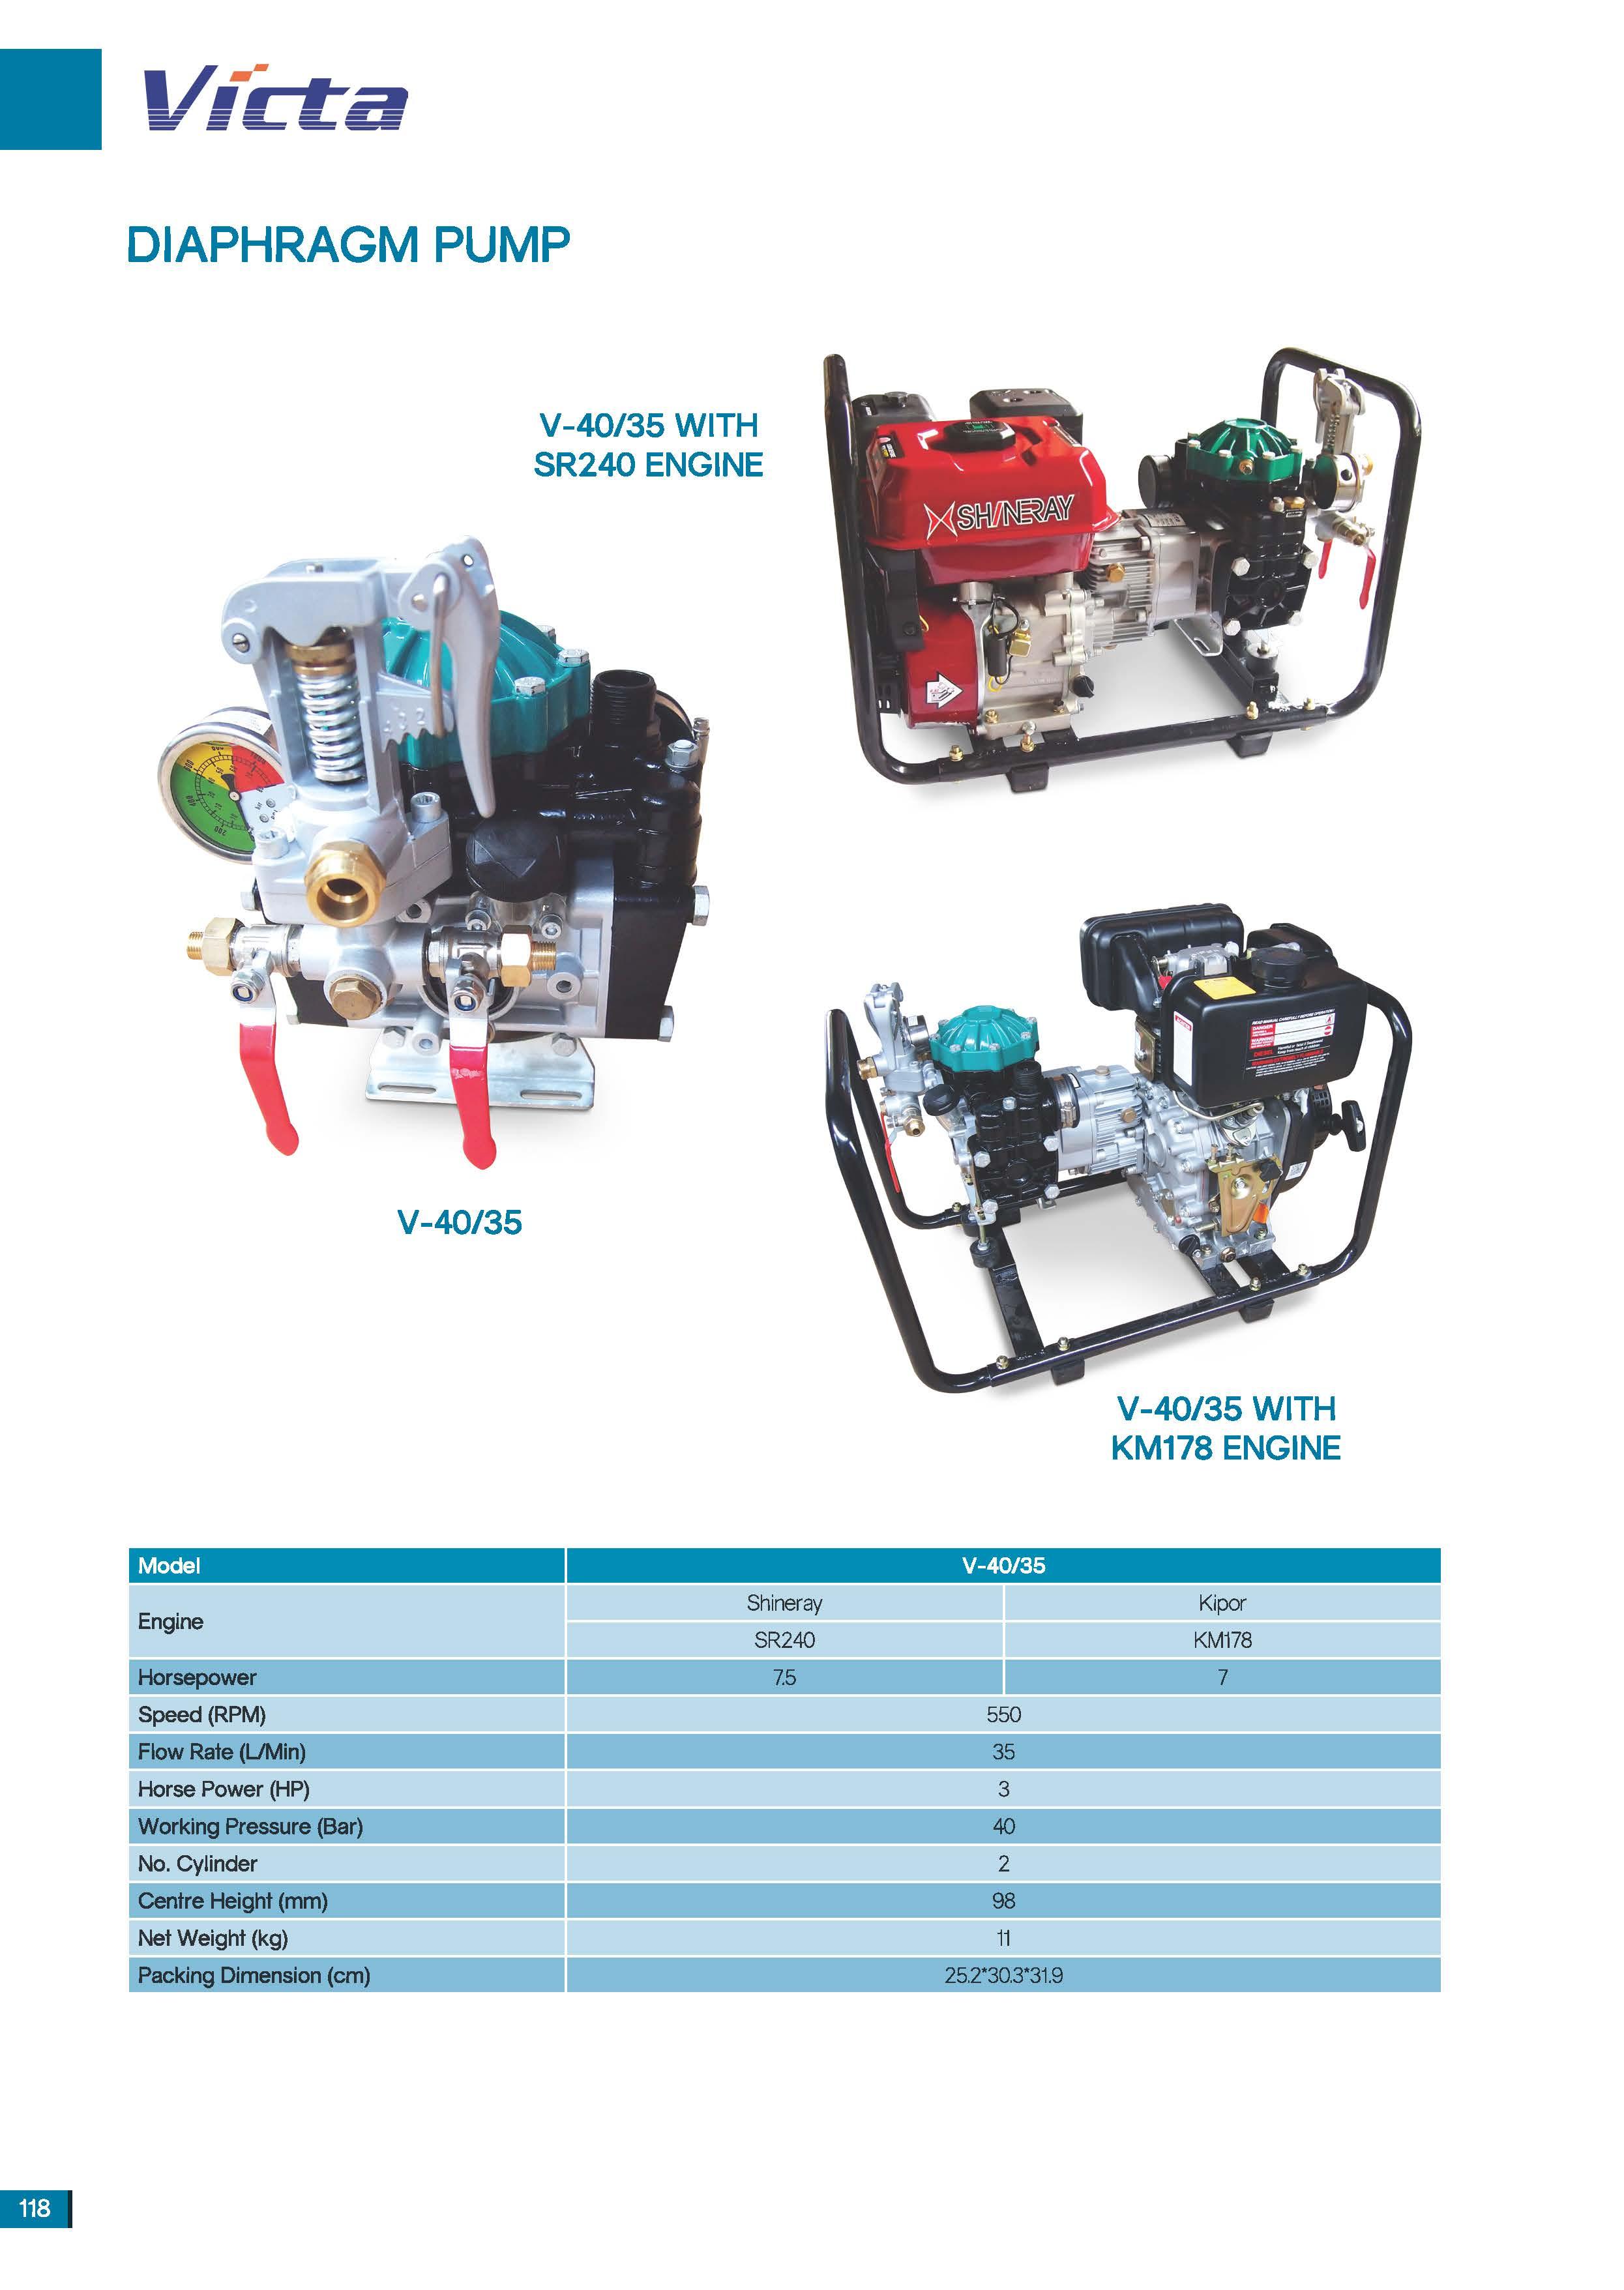 Malaysia victa diaphragm pump v 4035 with sr240 engine victa description ccuart Images